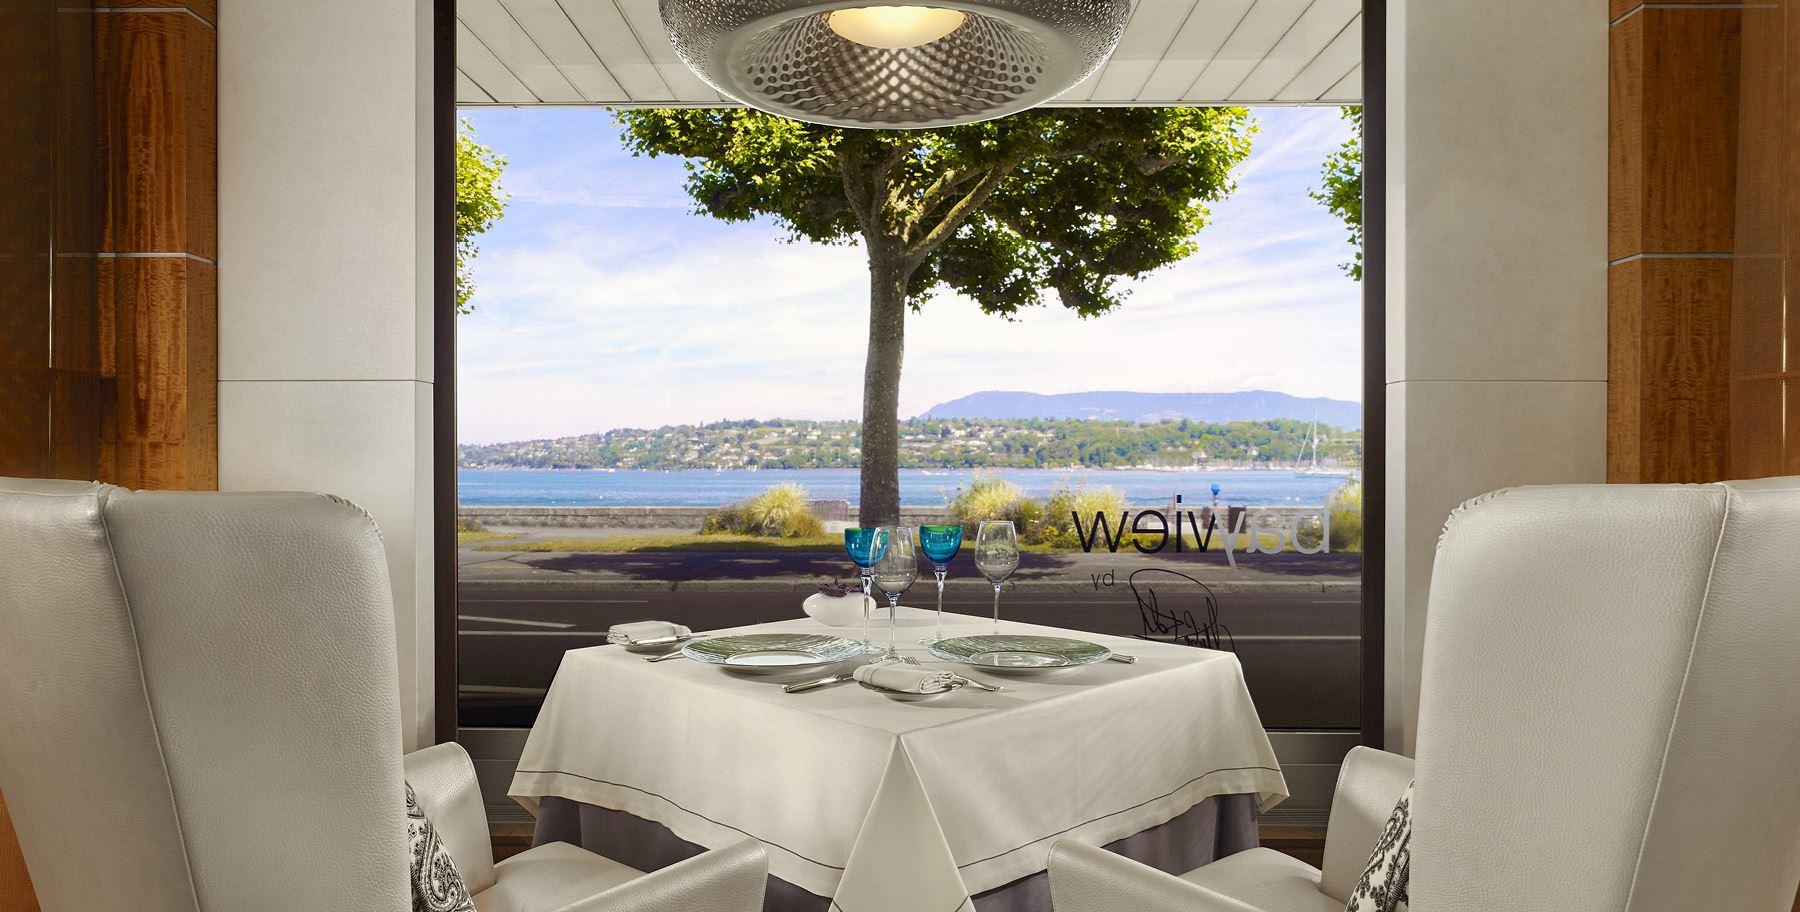 Restaurant Bayview By Michel Roth | Michelin Starred ... serapportantà Restaurant Avec Jardin Ile De France